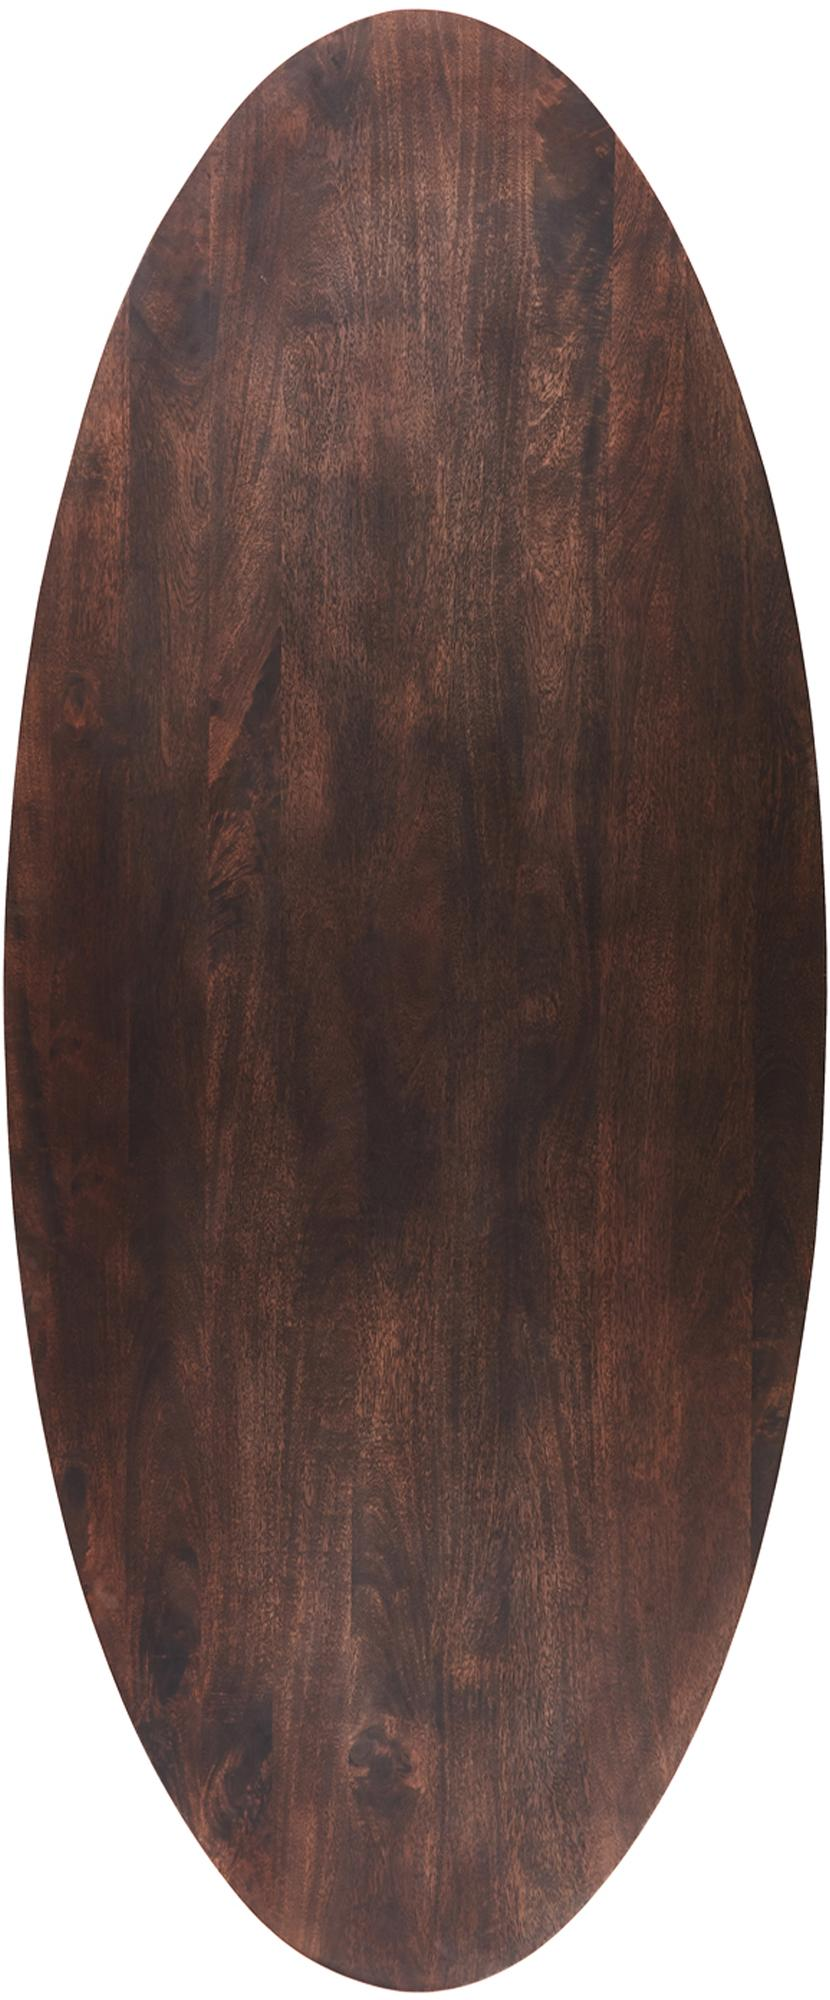 Ovale massief houten eettafel Luca in bruin, Tafelblad: gelakt massief mangohout, Frame: gecoat metaal, Tafelblad: donker gelakt mangohout. Frame: goudkleurig, B 240 x D 100 cm